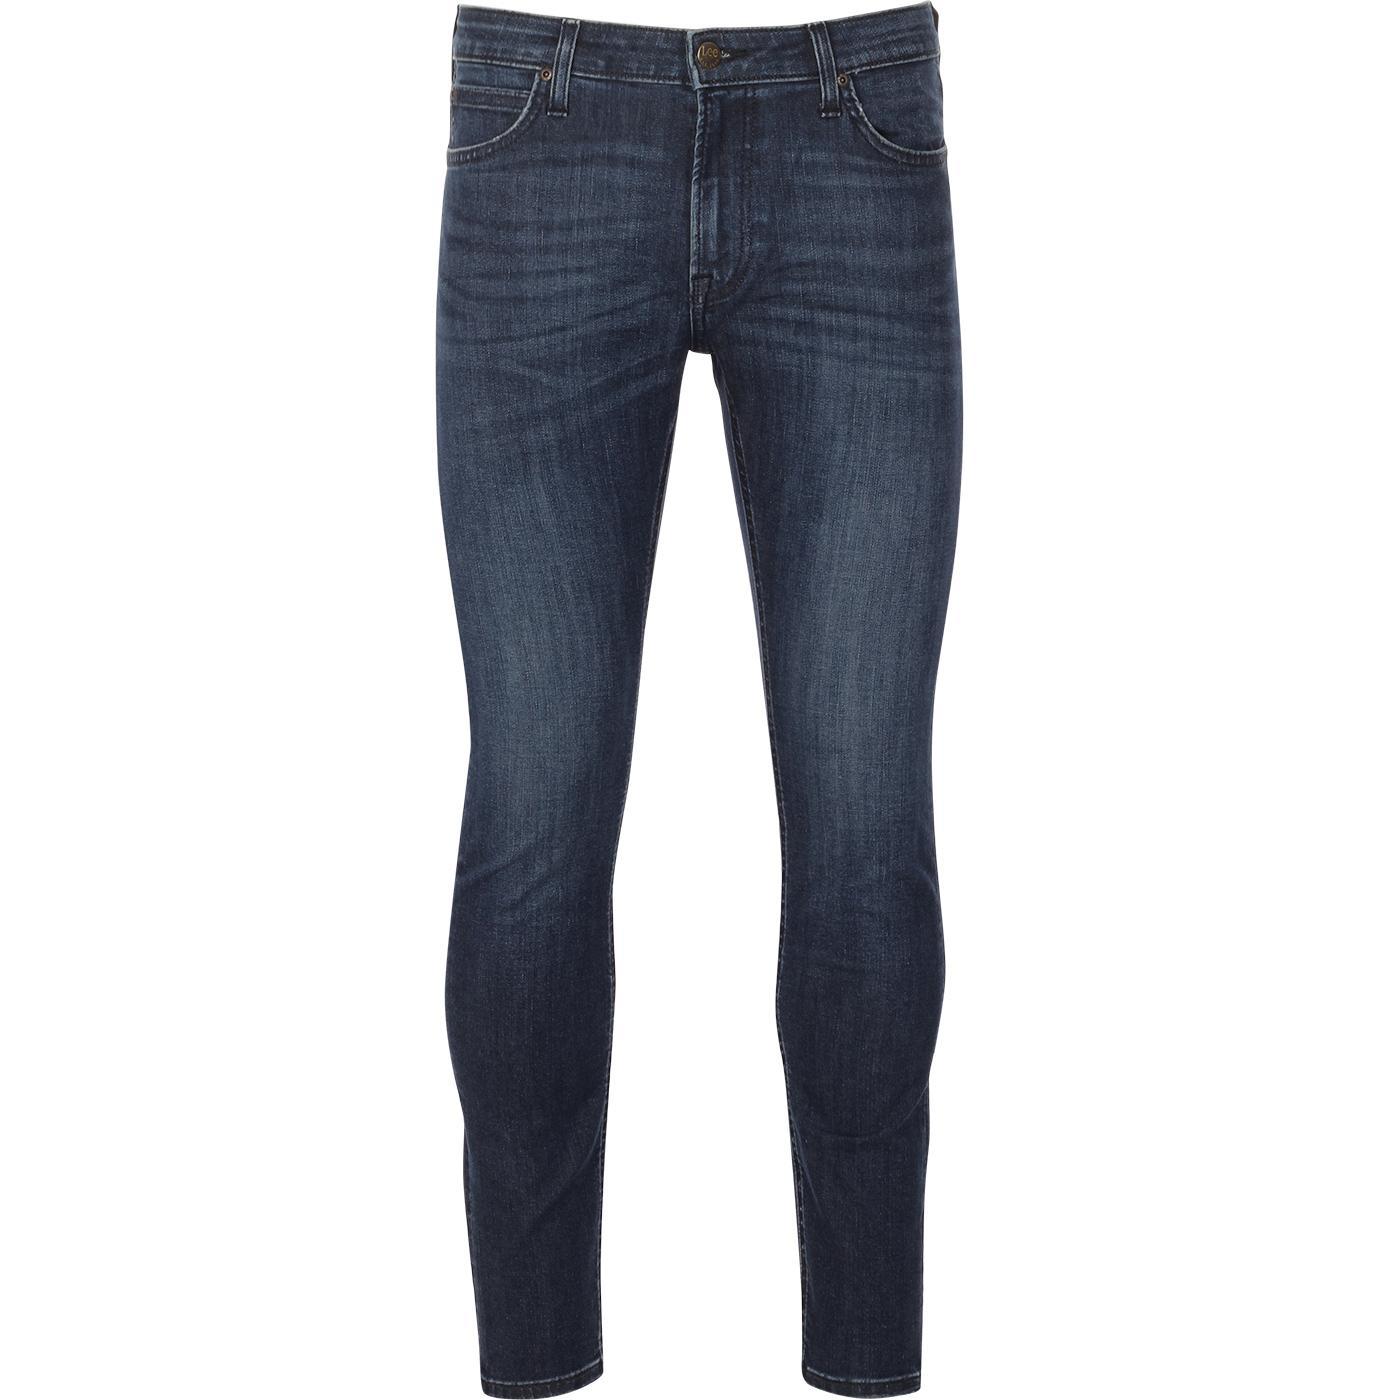 Malone LEE Mod Dark Blue Skinny Drainpipe Jeans